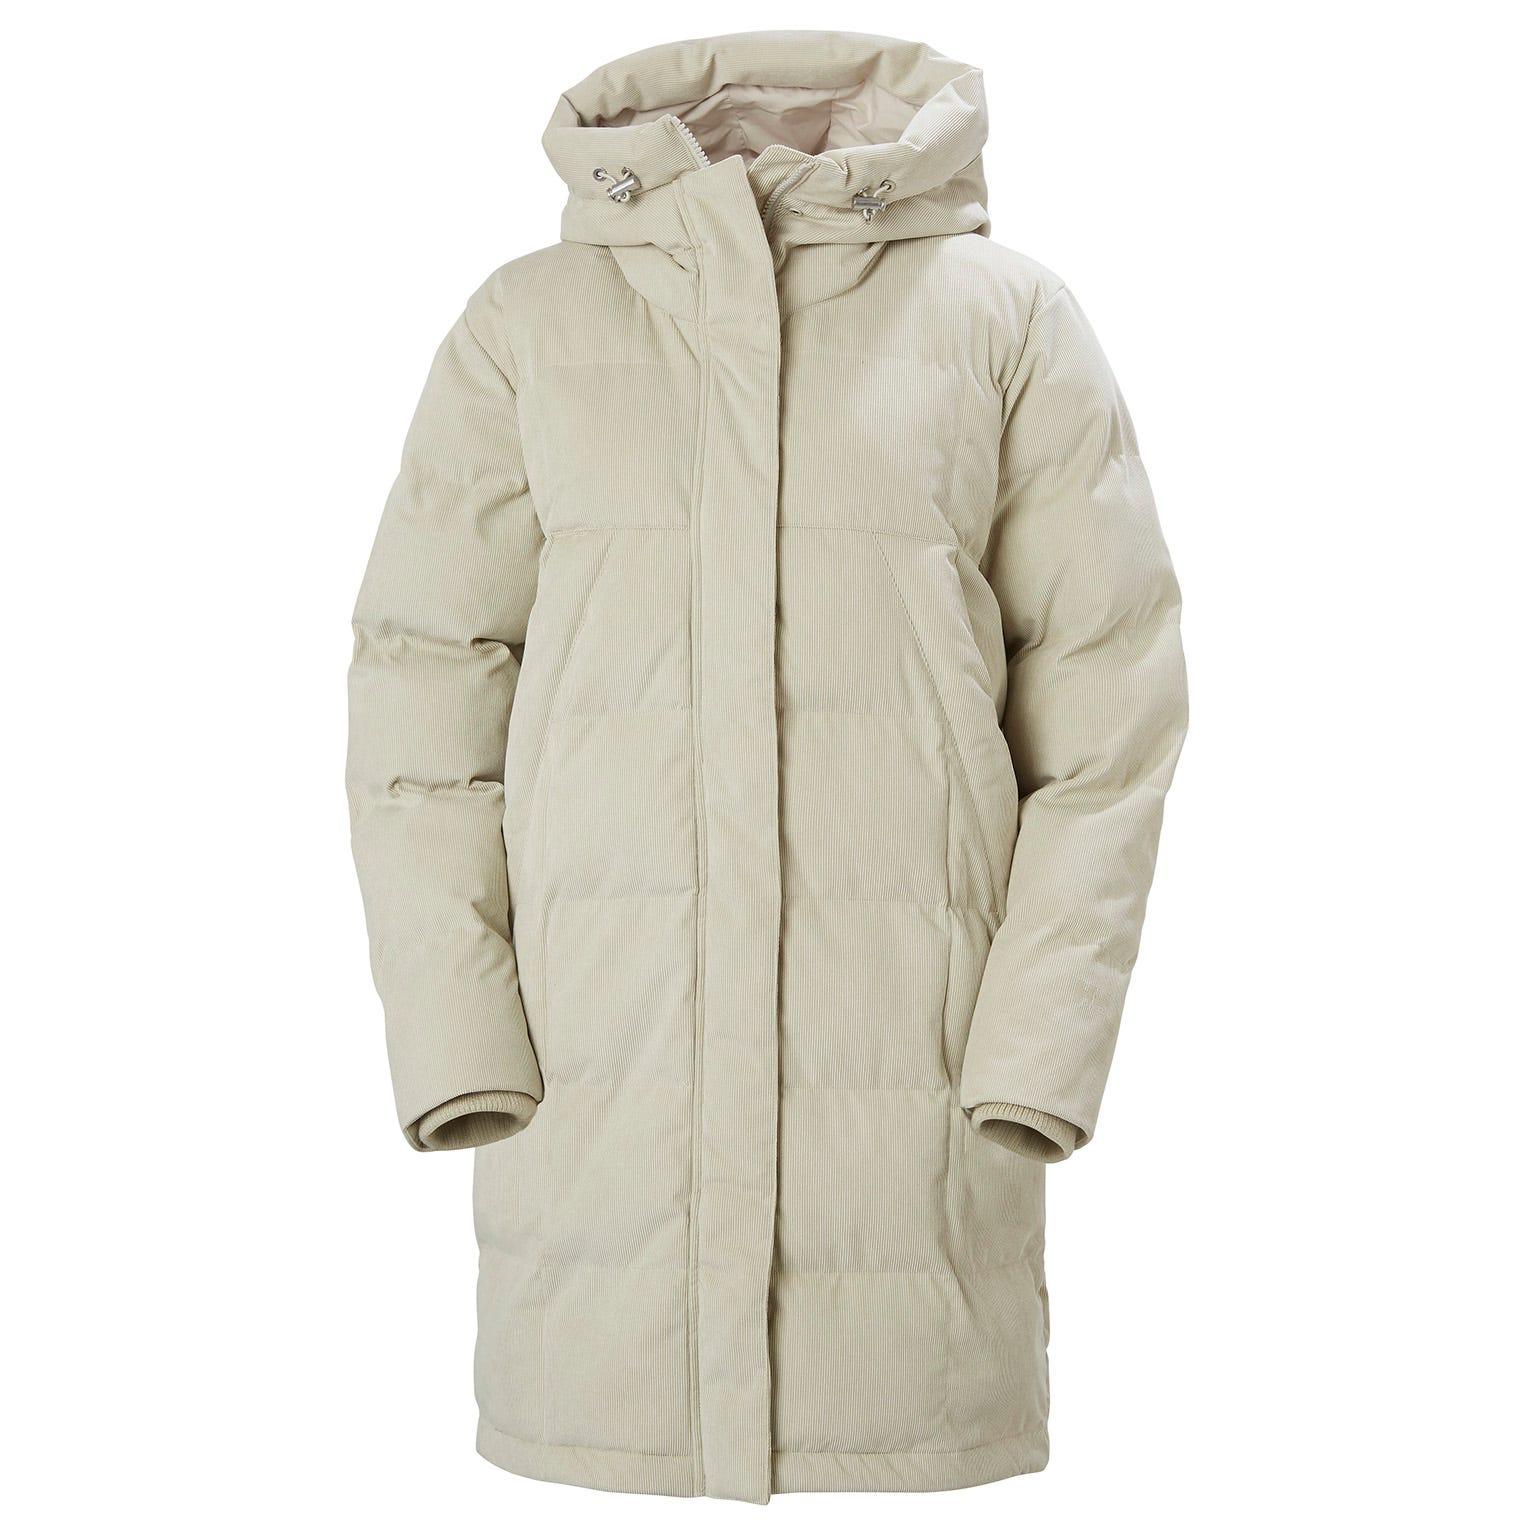 Helly Hansen Womens Jpn Quilted Coat Parka XL